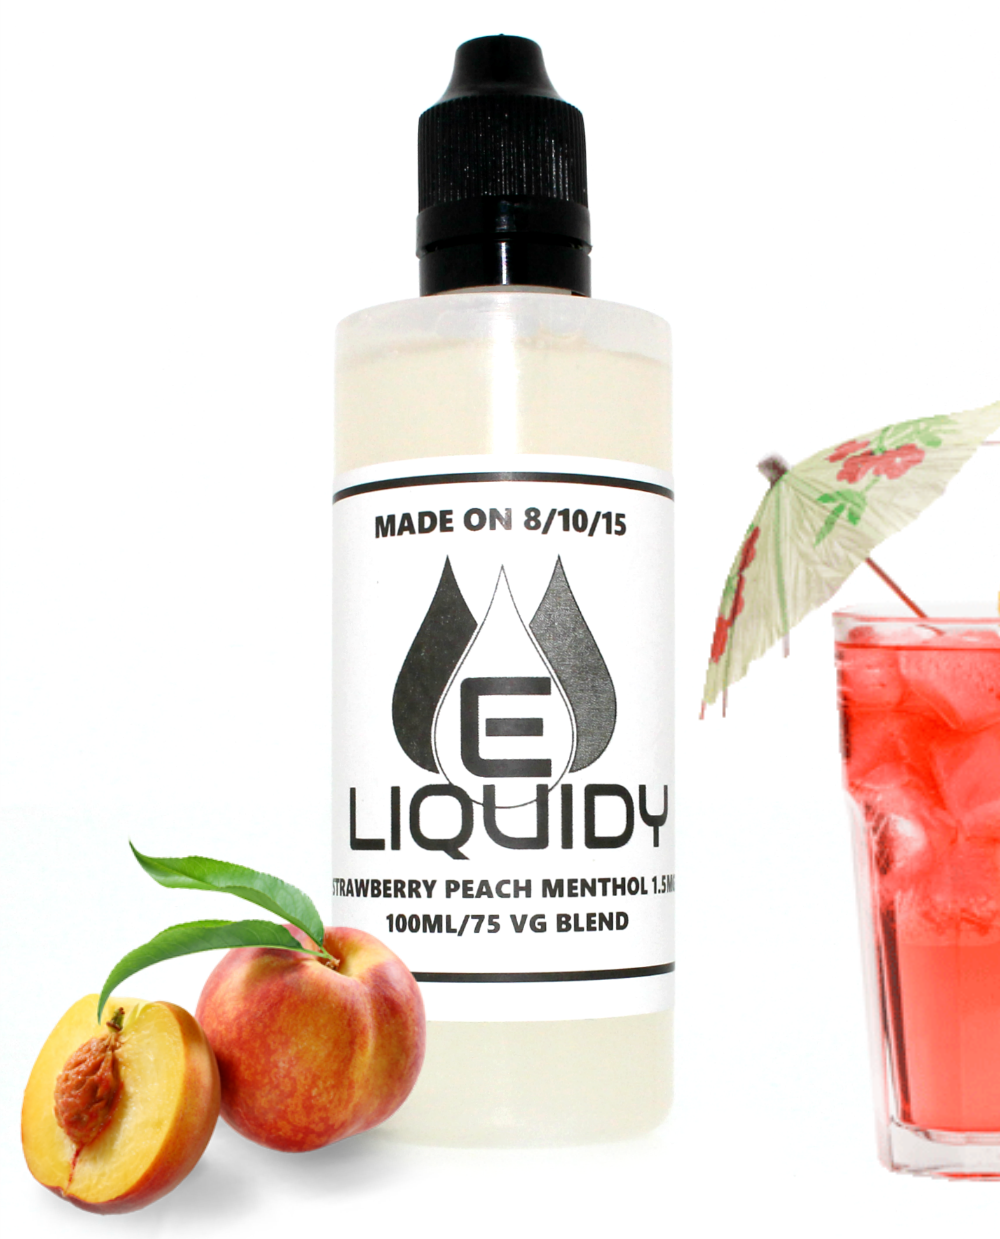 Eliquidy Strawberry Peach Menthol